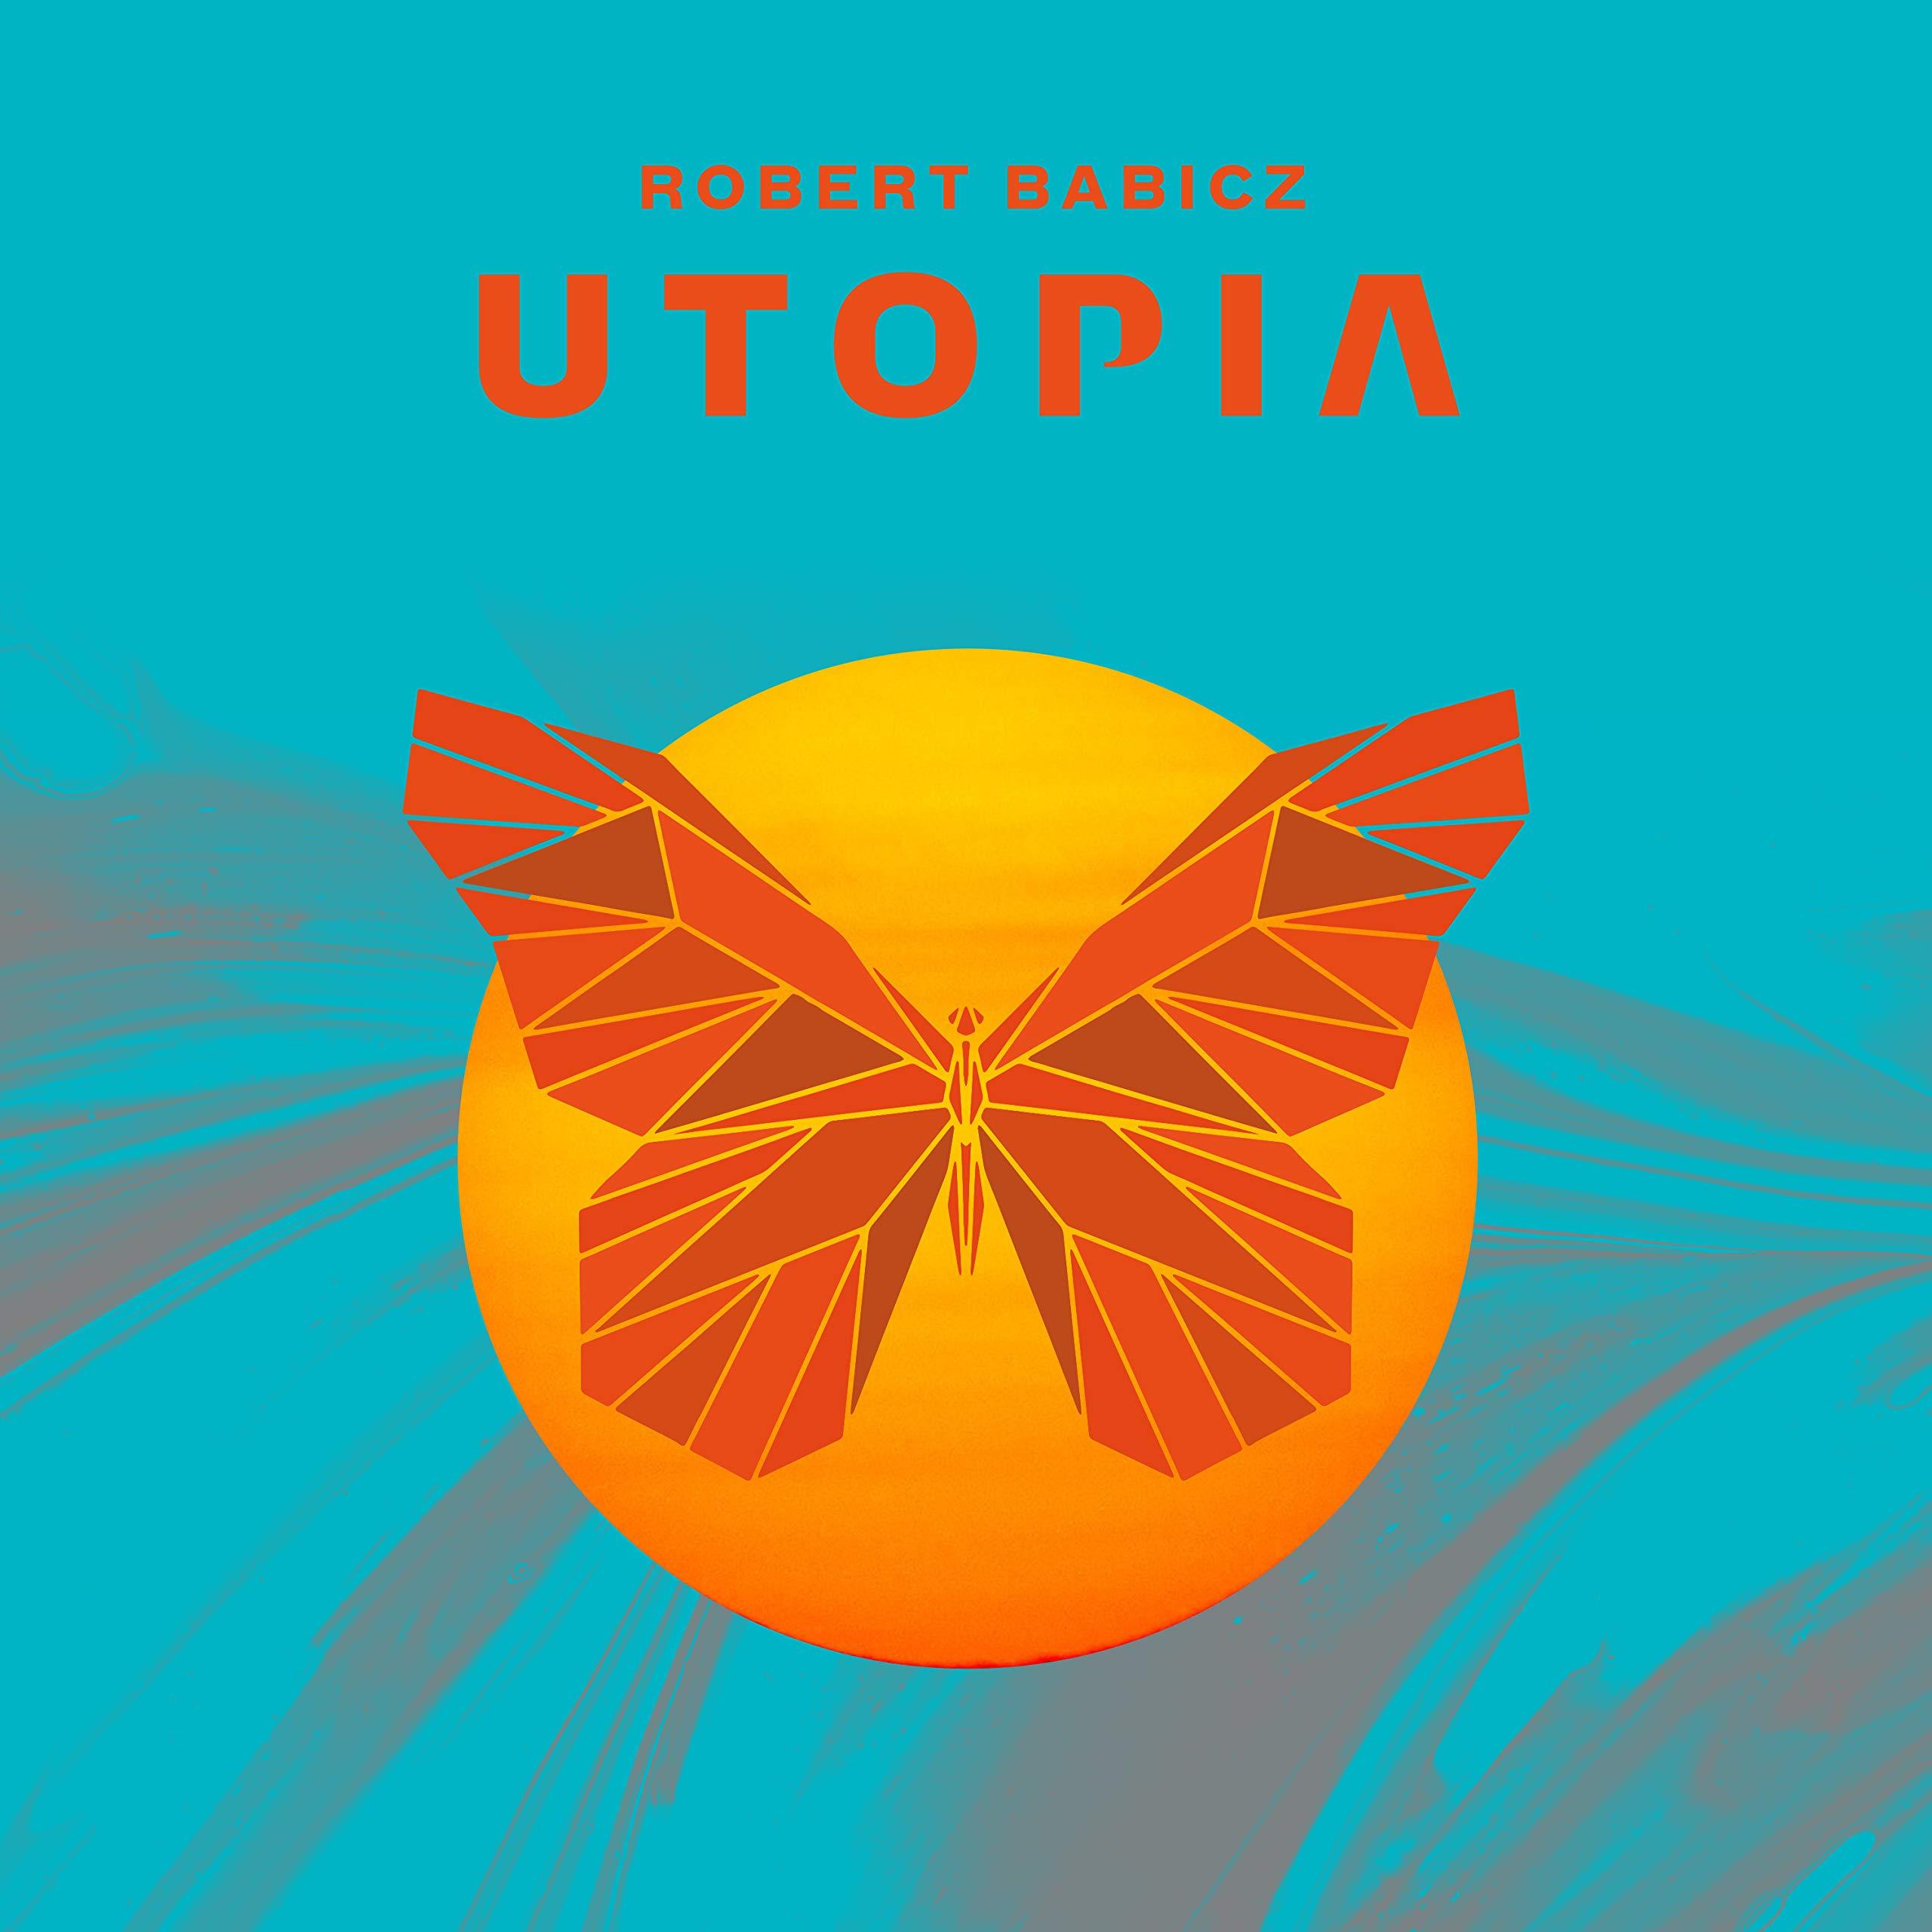 Robert Babicz - Utopia (2020) [FLAC] Download